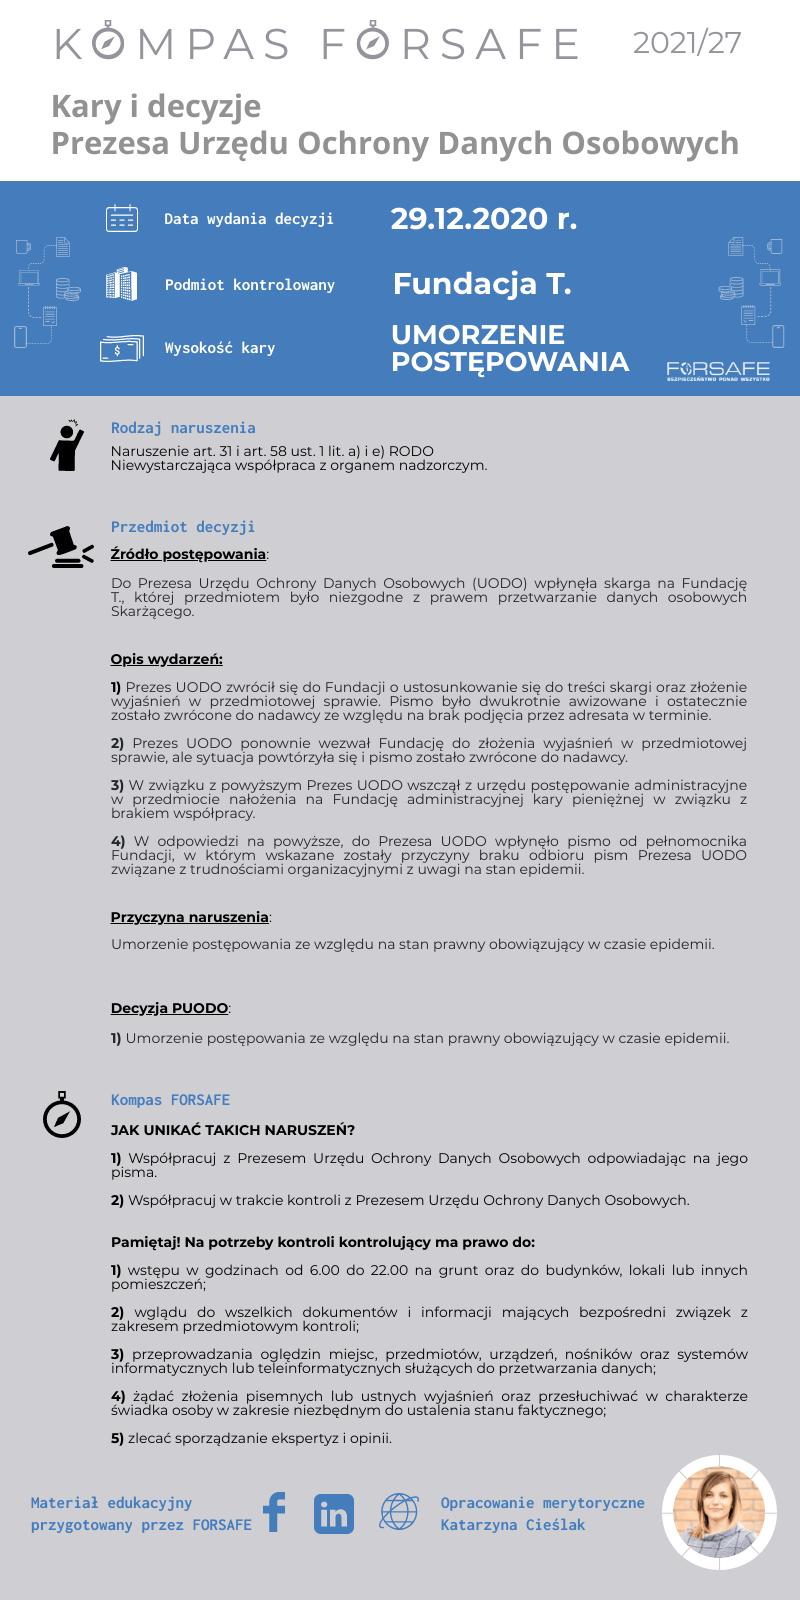 Kompas FORSAFE PL 2021 27 KOMPAS FORSAFE PL 2021/27 - Umorzenie kary dla Fundacji T.